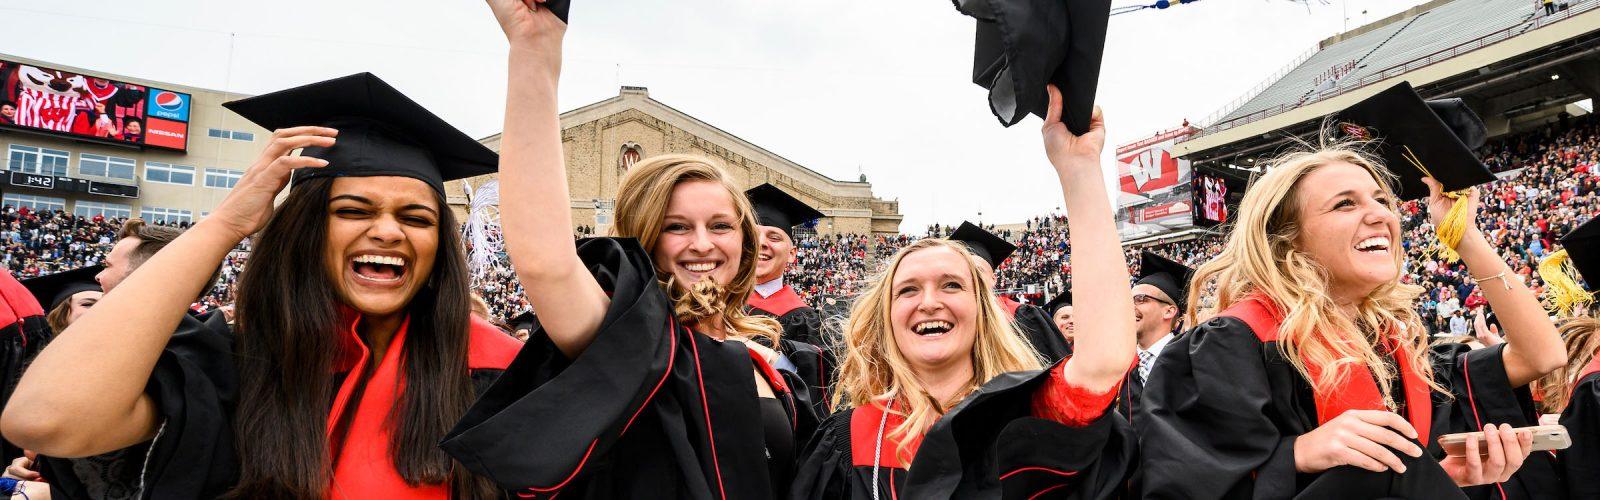 celebrating UW graduates